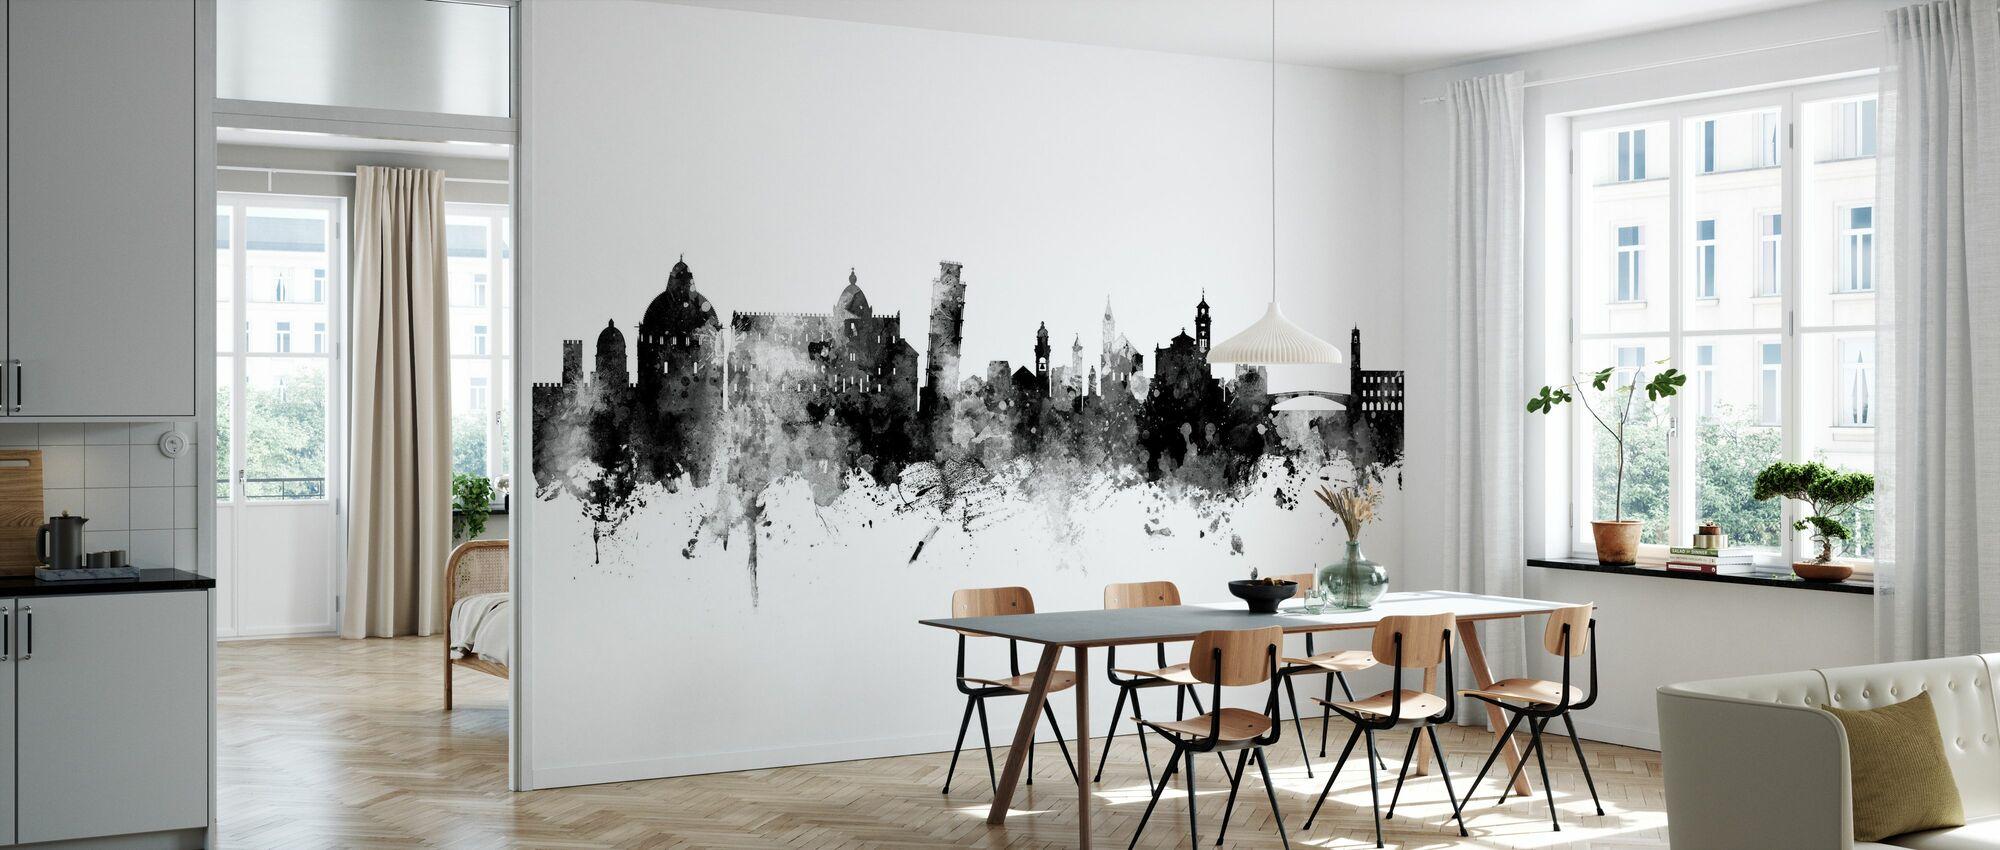 Pisa Italy Skyline - Wallpaper - Kitchen